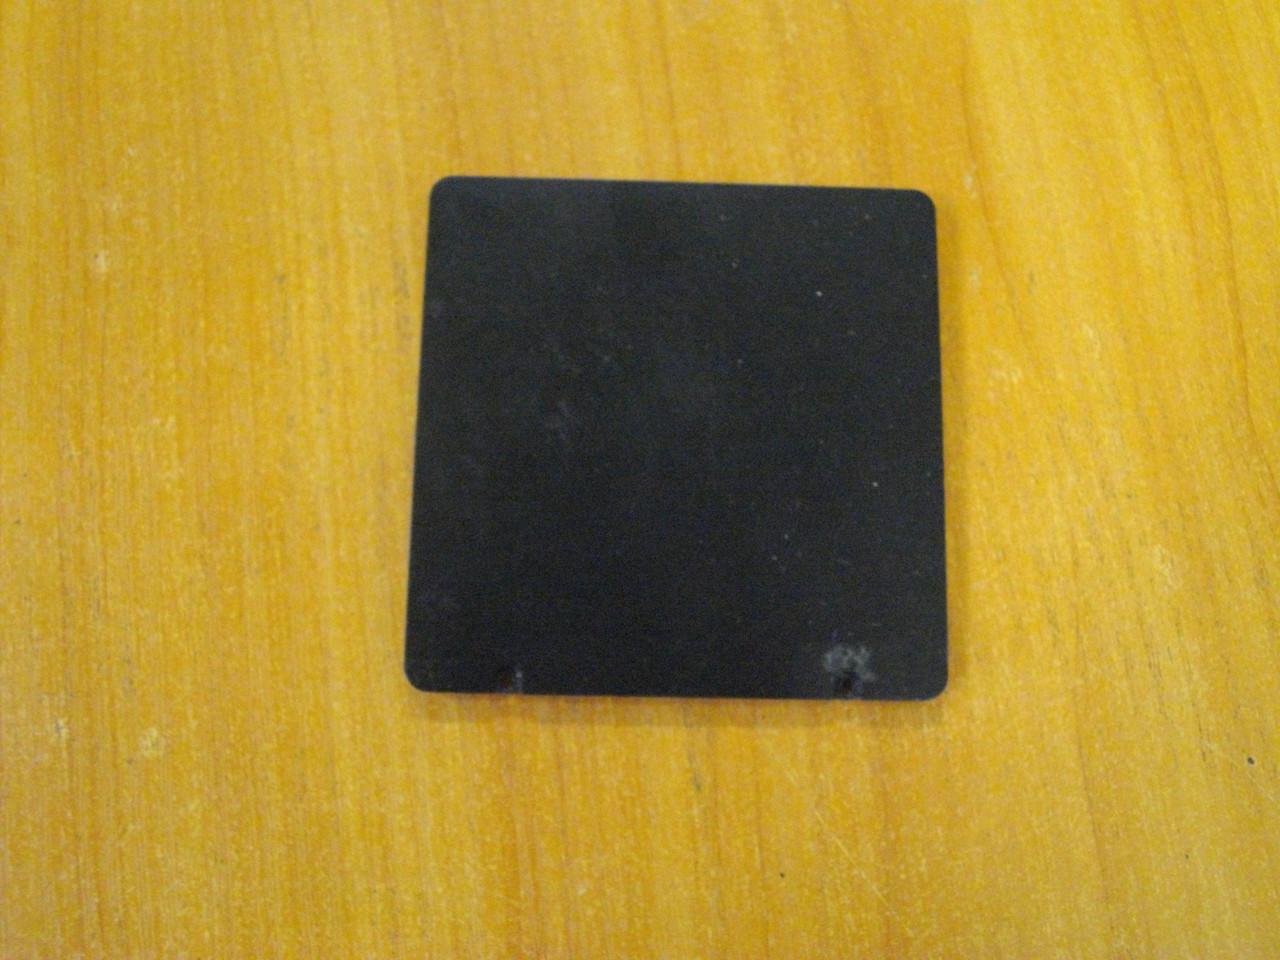 Сервисная Крышка Люк Корпус от ноутбука ASUS Eee PC 900 бу